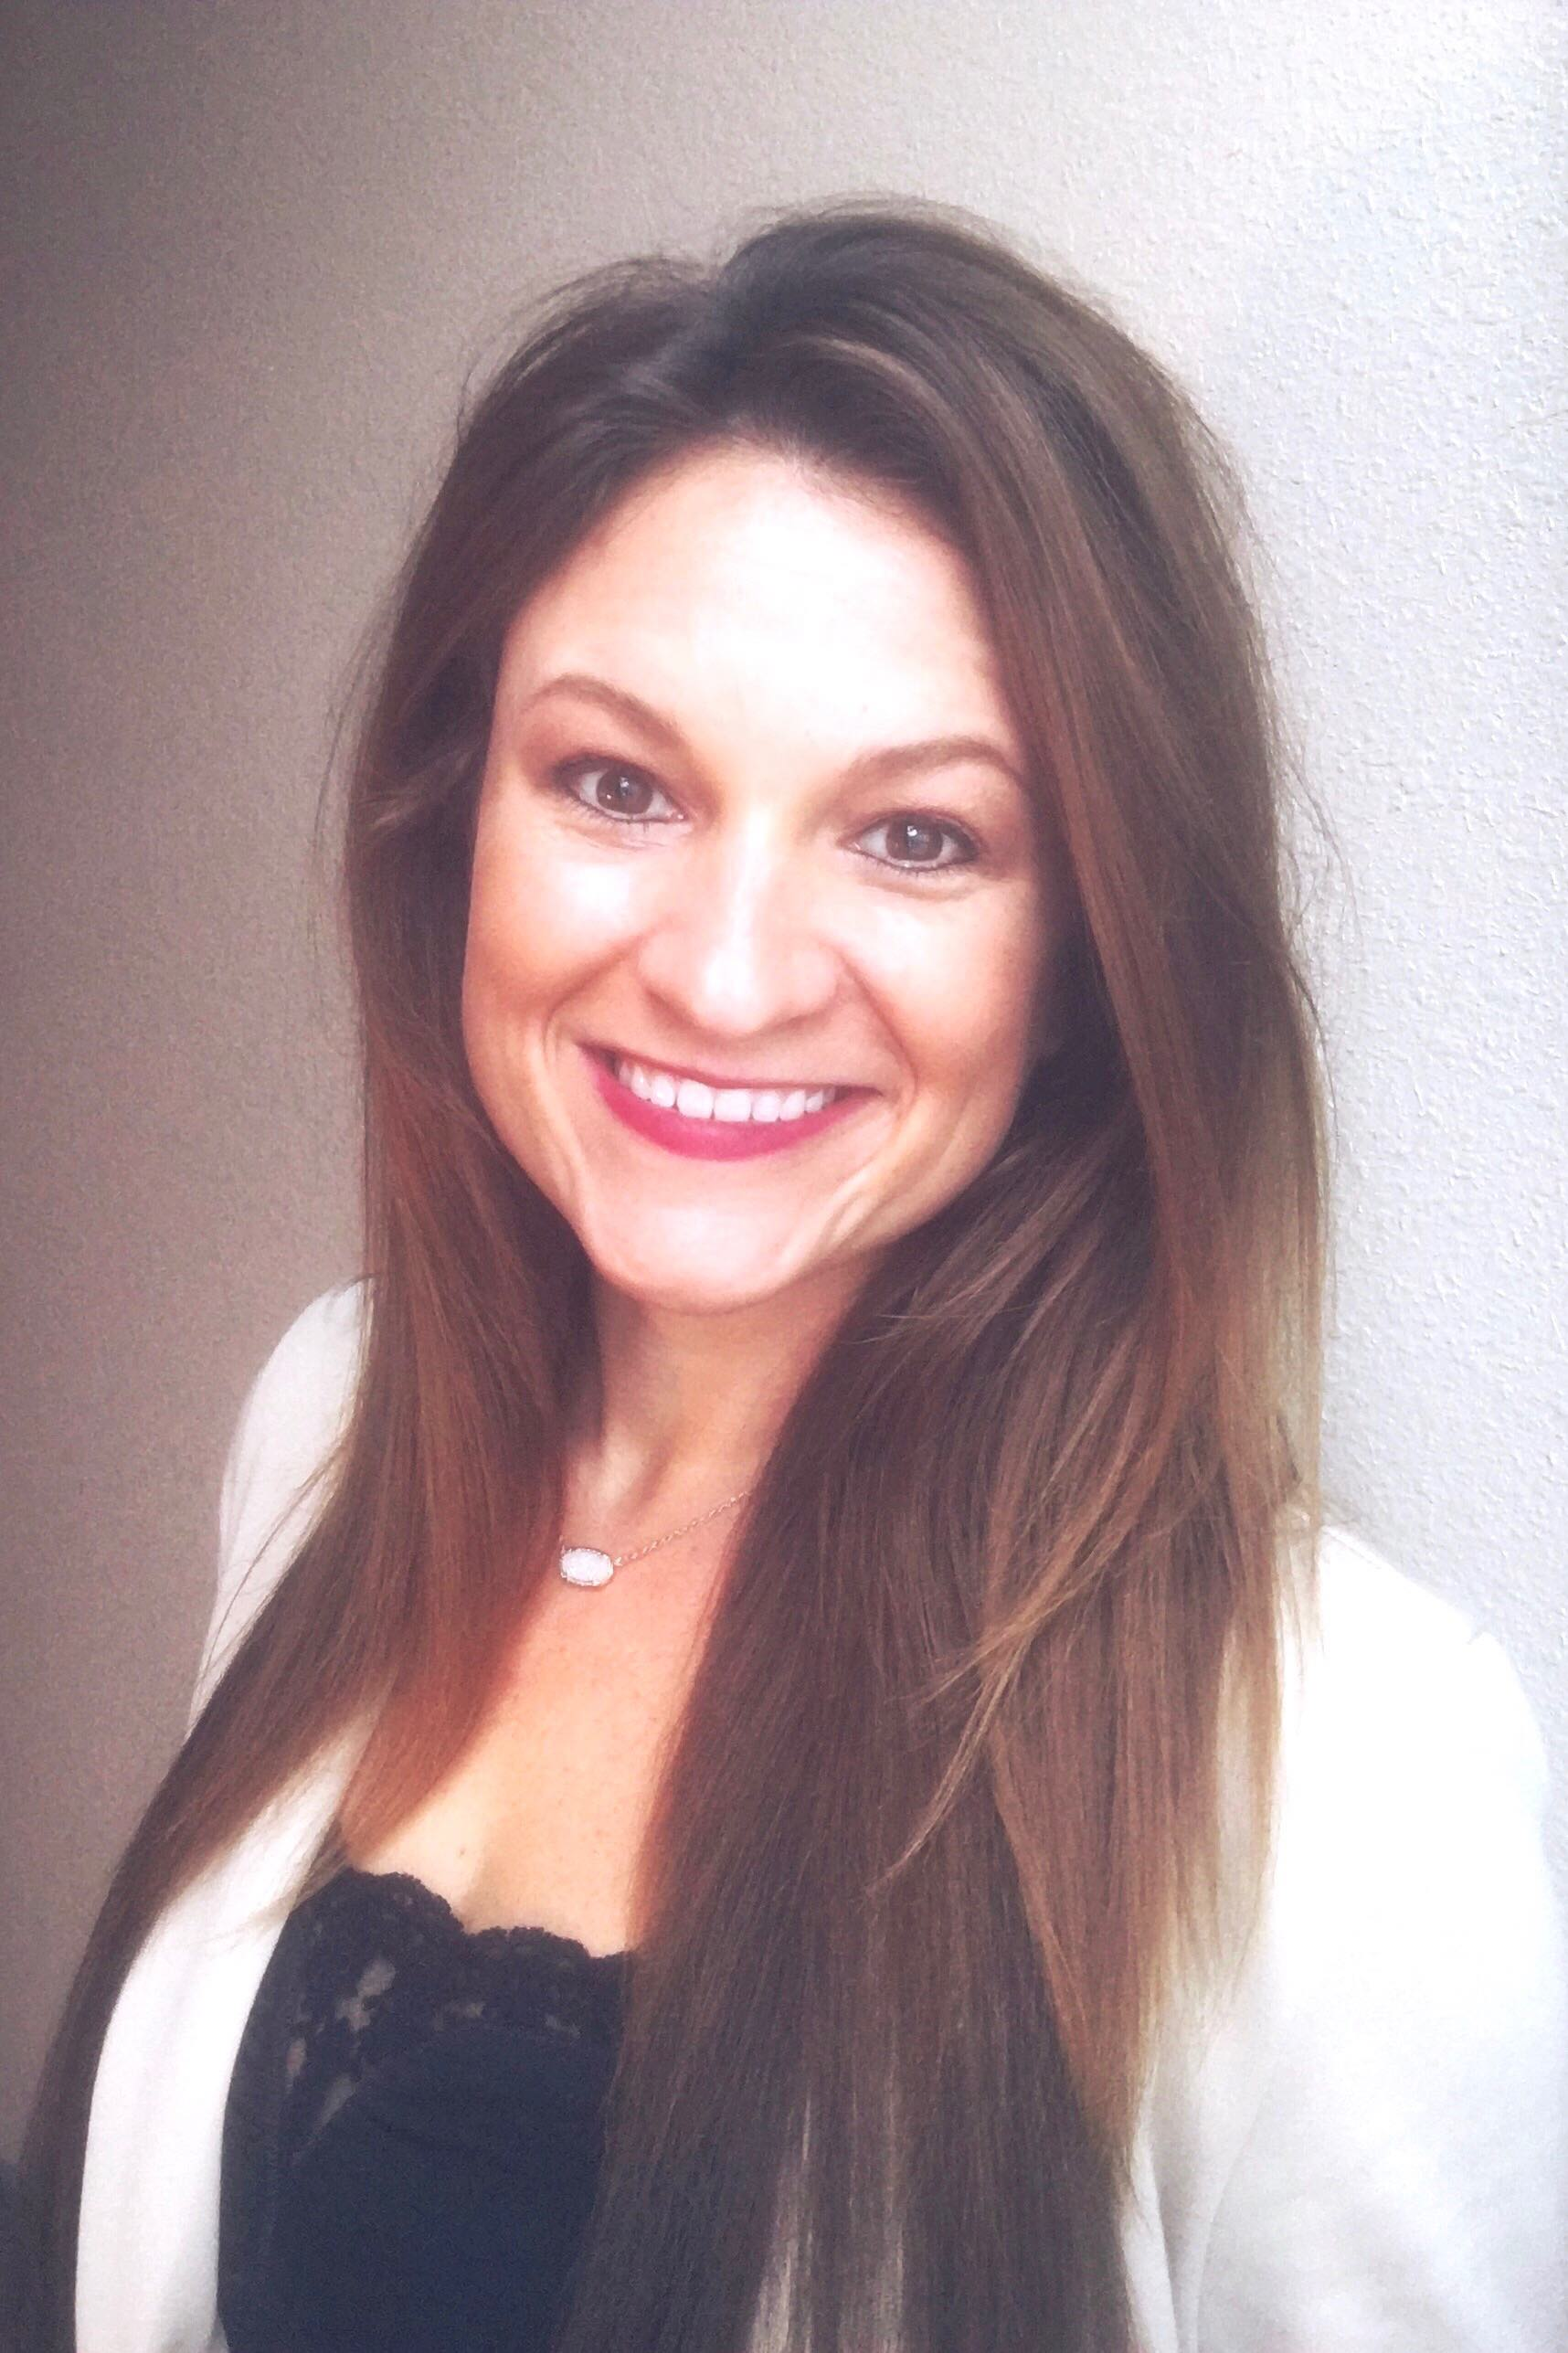 Megan Owensby